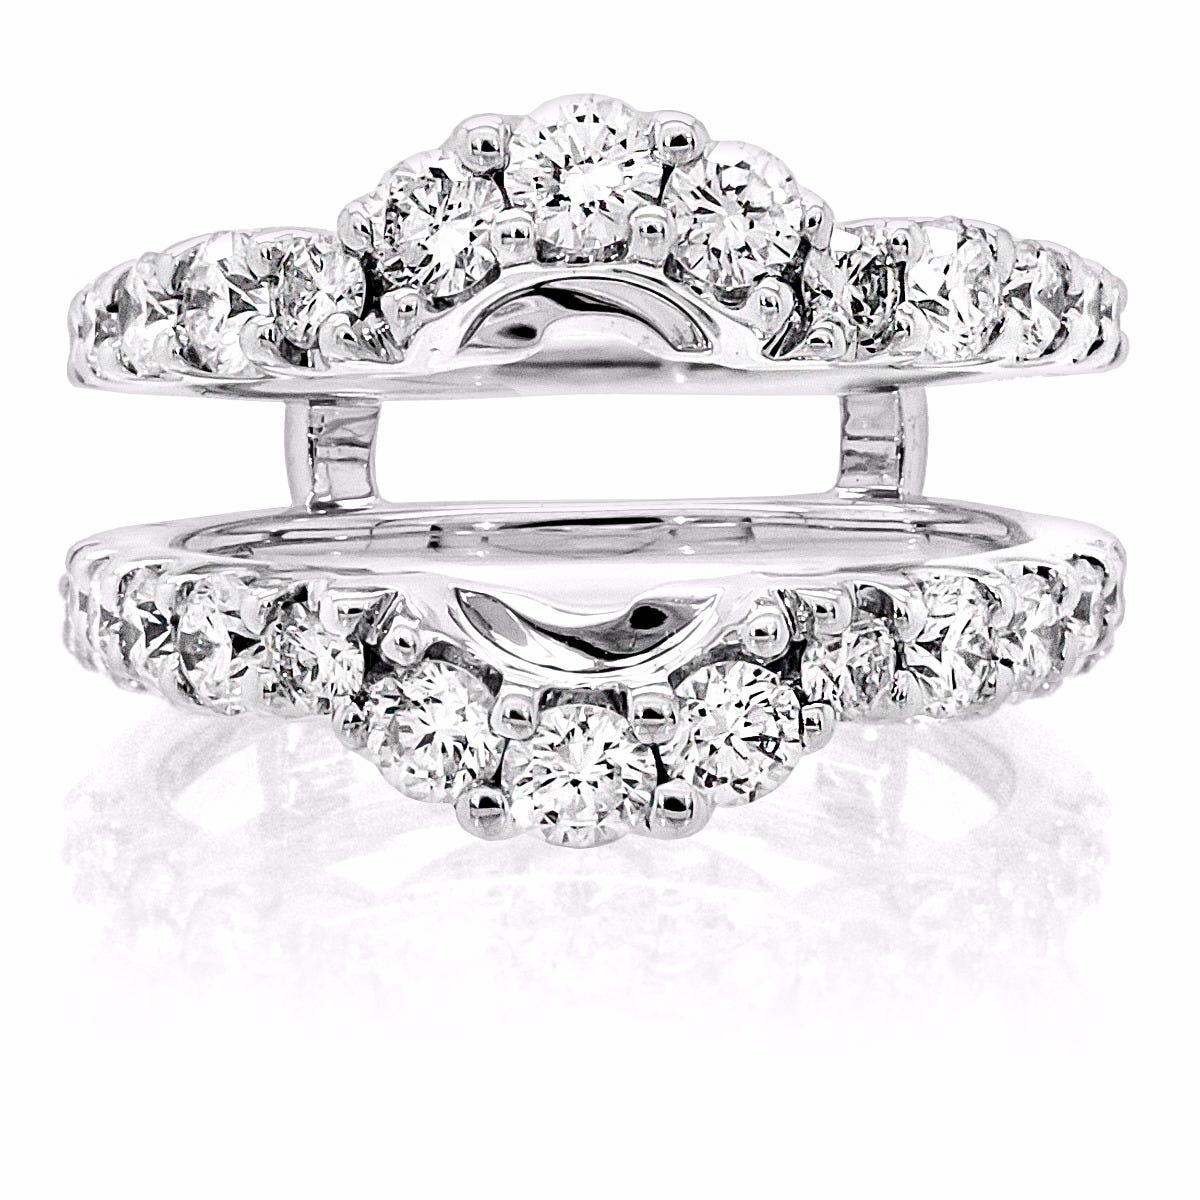 Diamond Engagement Ring Wrap Insert 1 50ctw